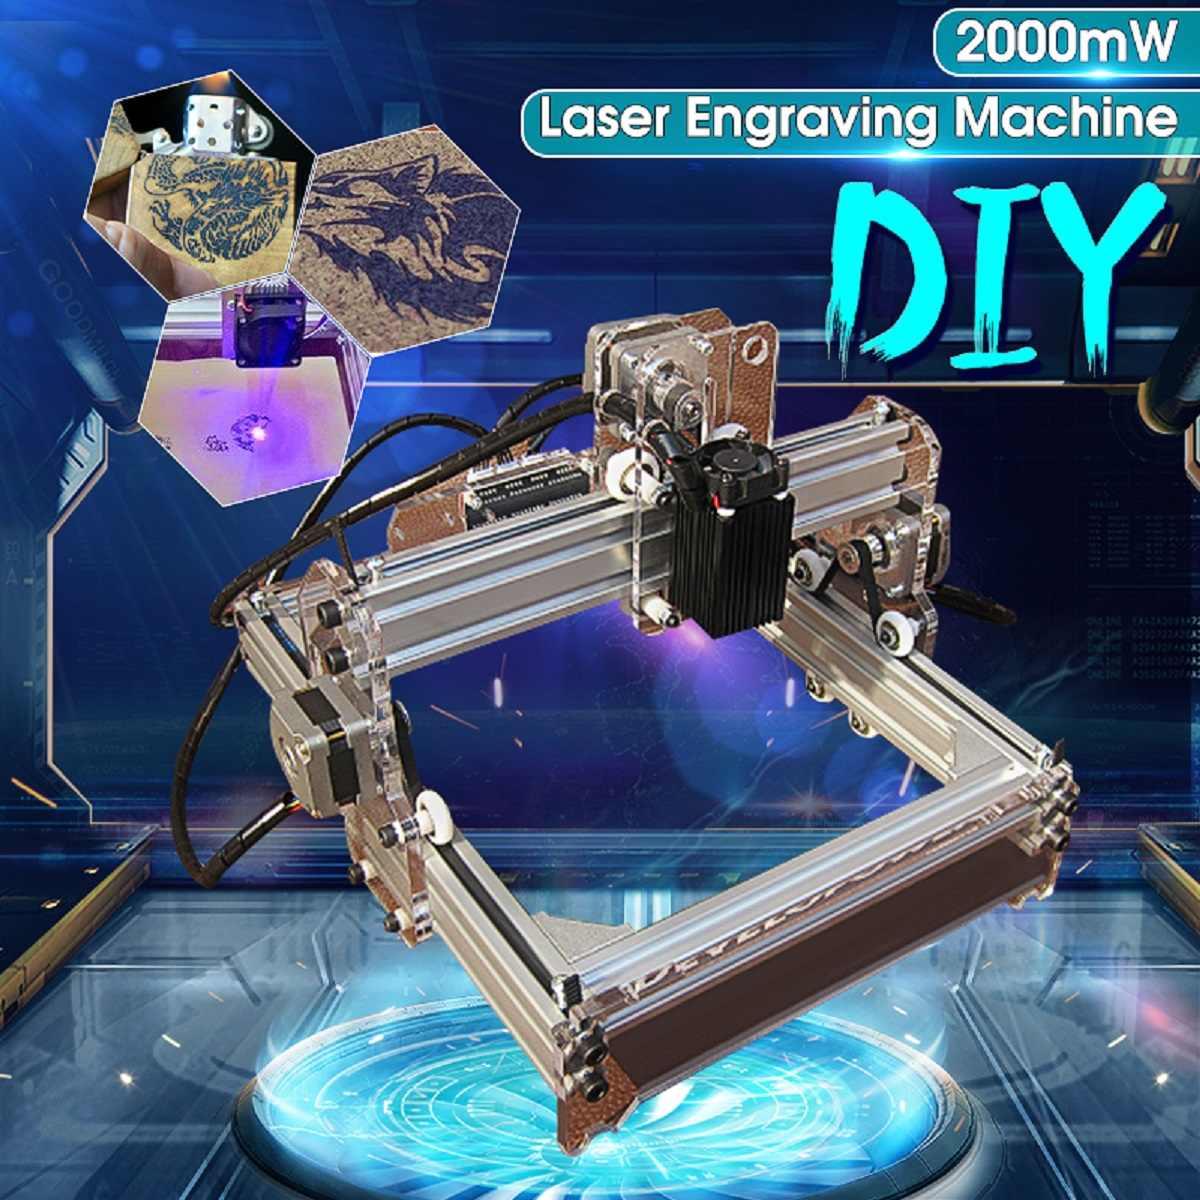 2000MW A5 17x20cm Laser Engraver Cutting Machine Desktop